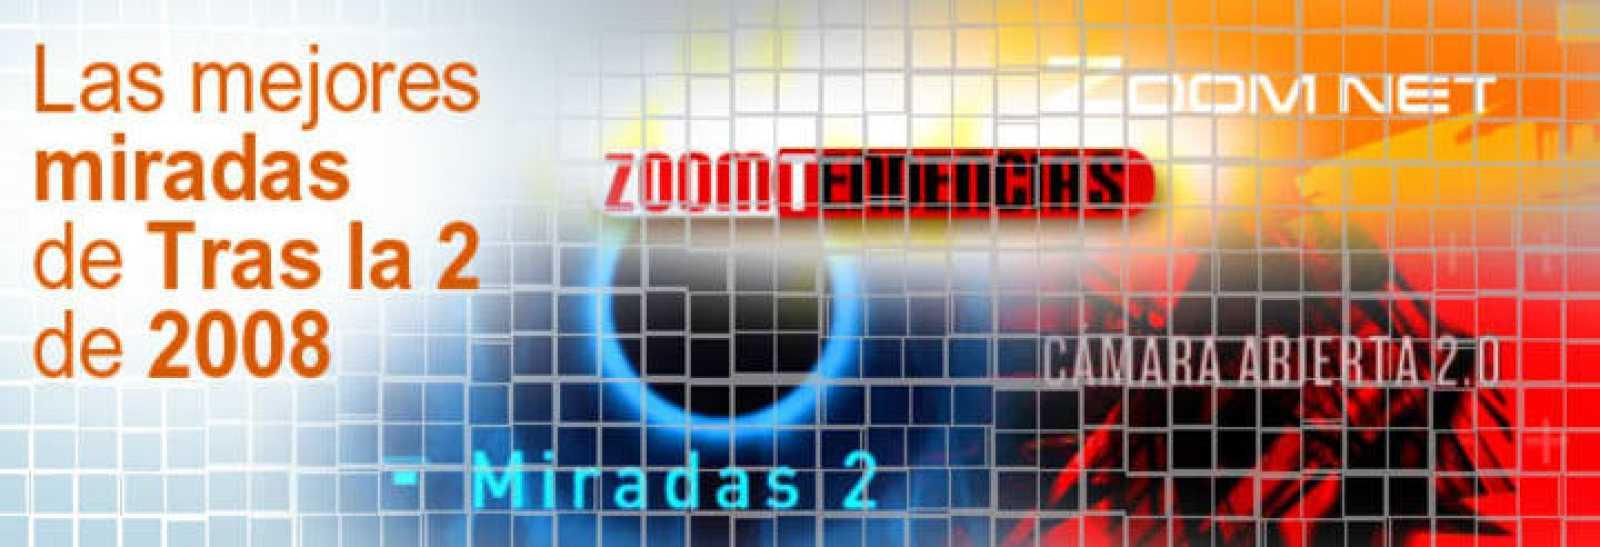 Premios Miradas 2008